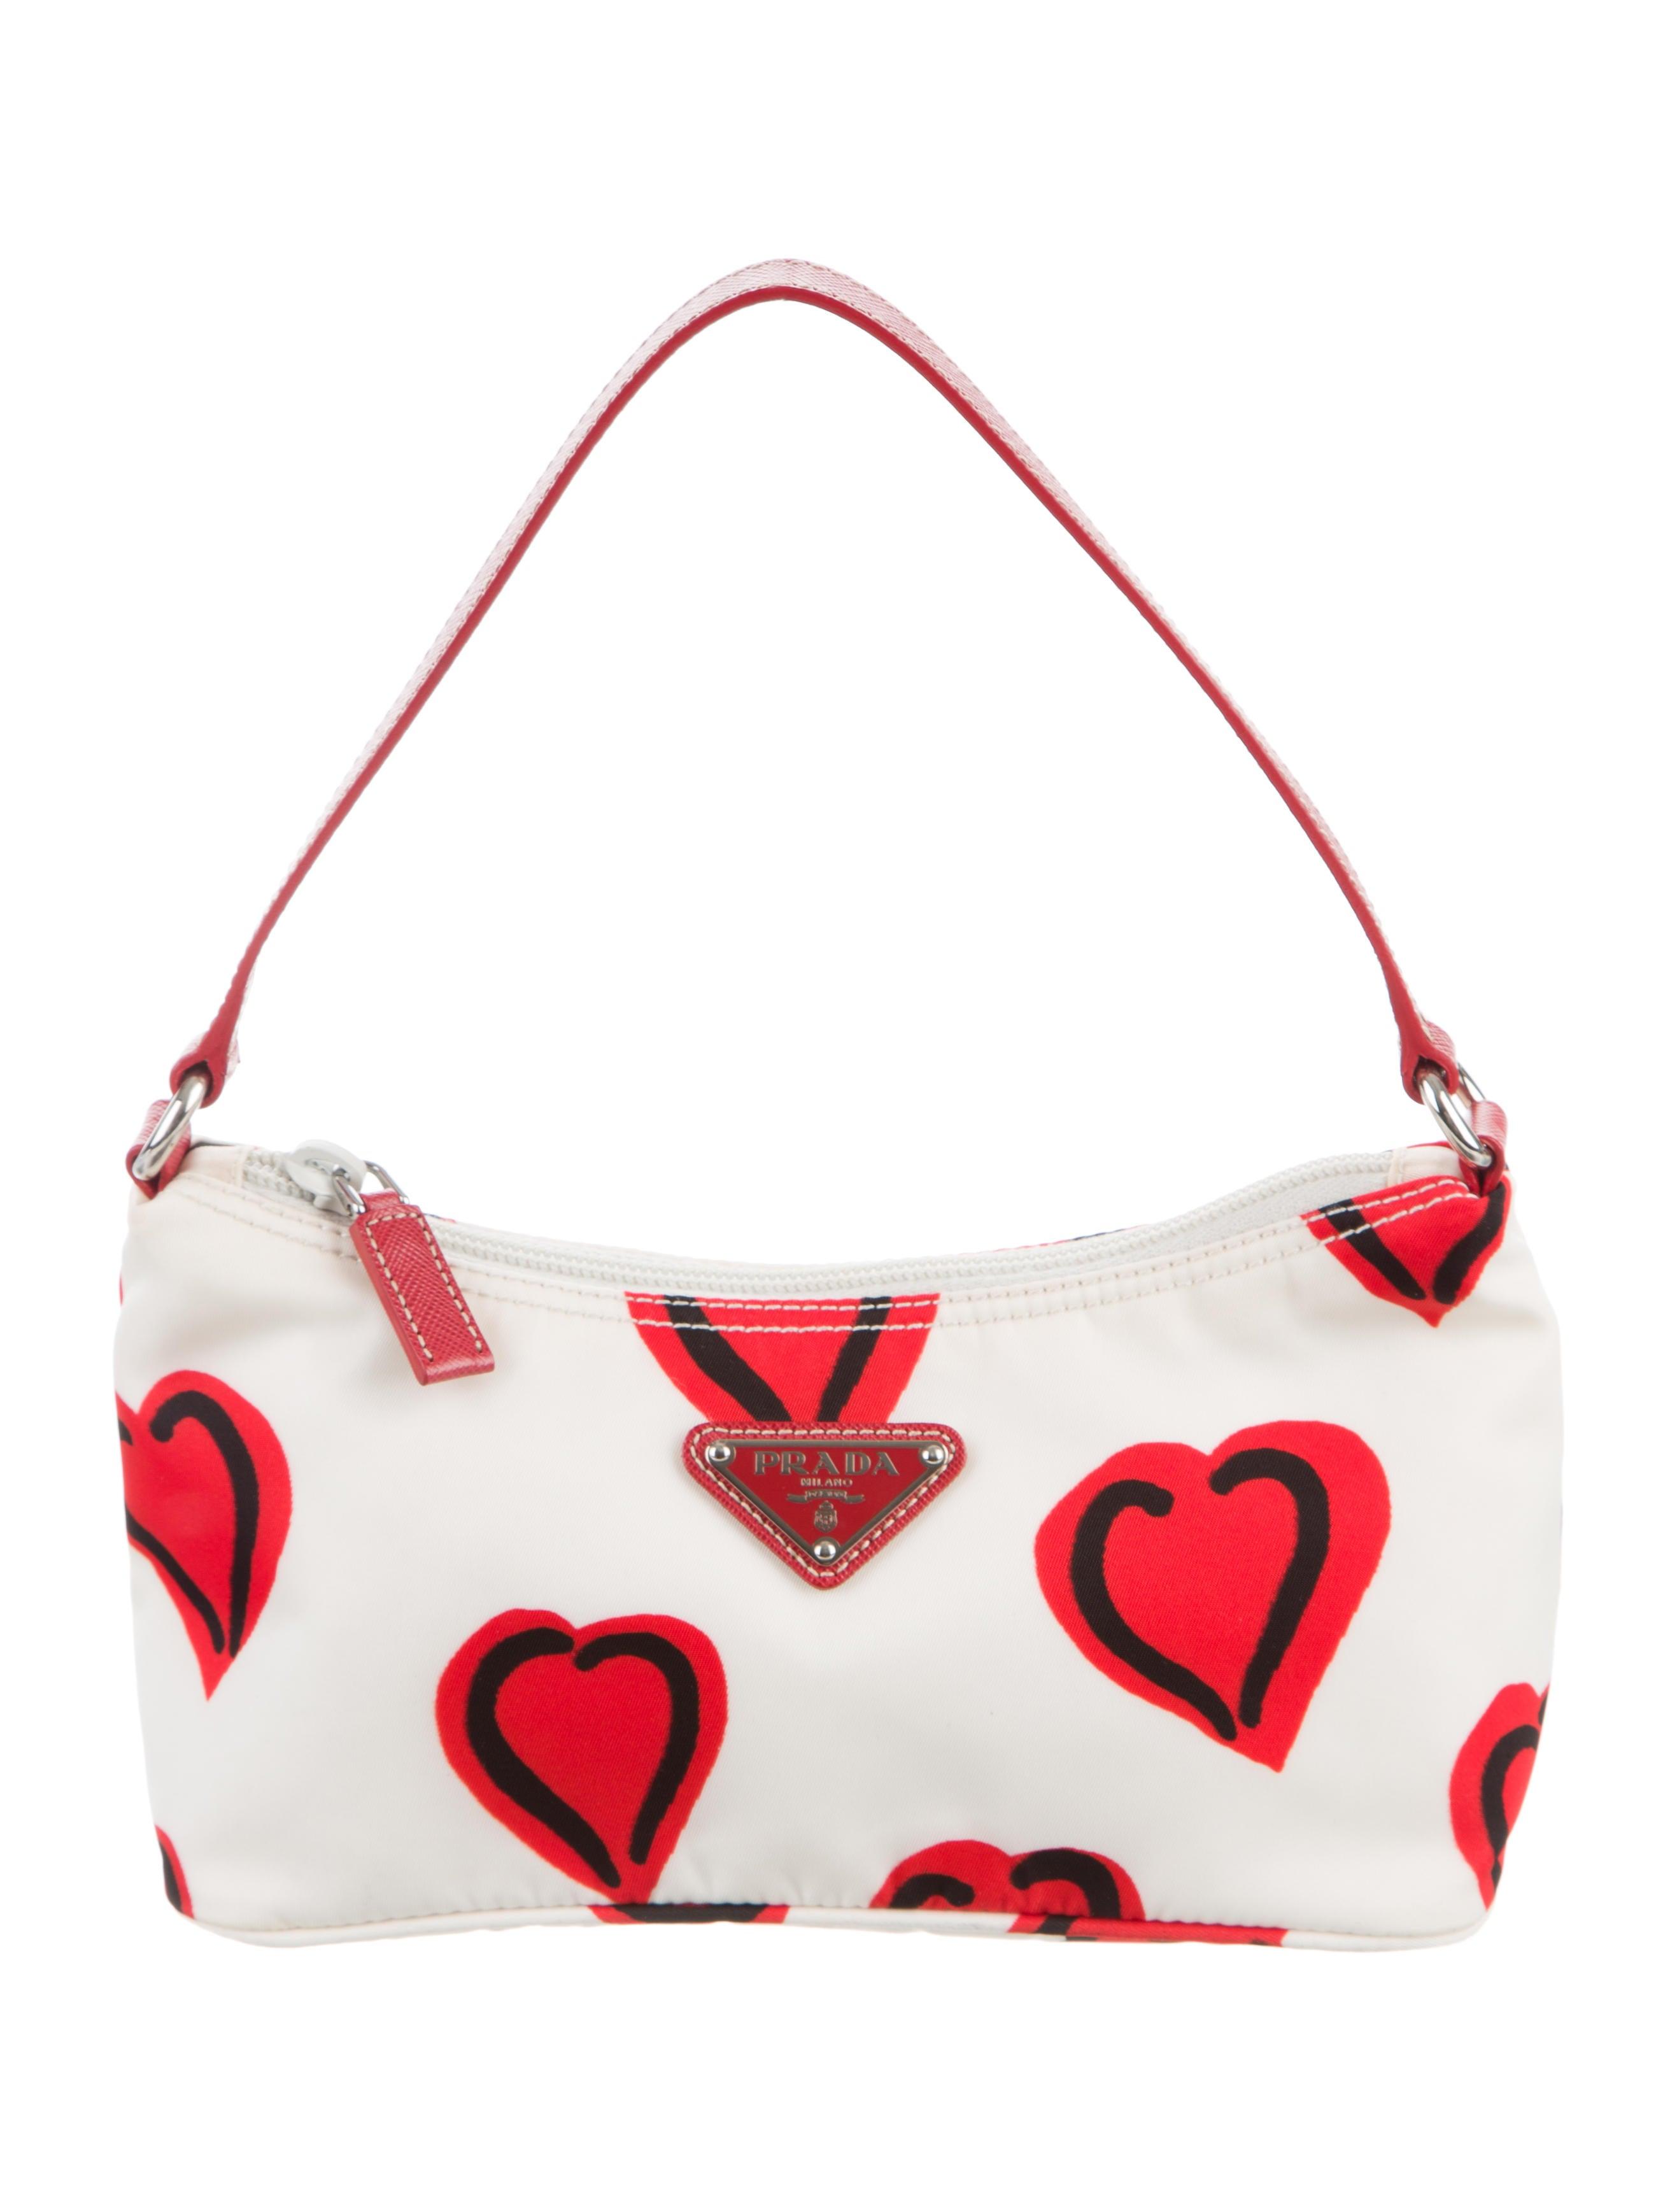 910f14da59cf Prada I Heart Shoulder Bag - Handbags - PRA134251 | The RealReal